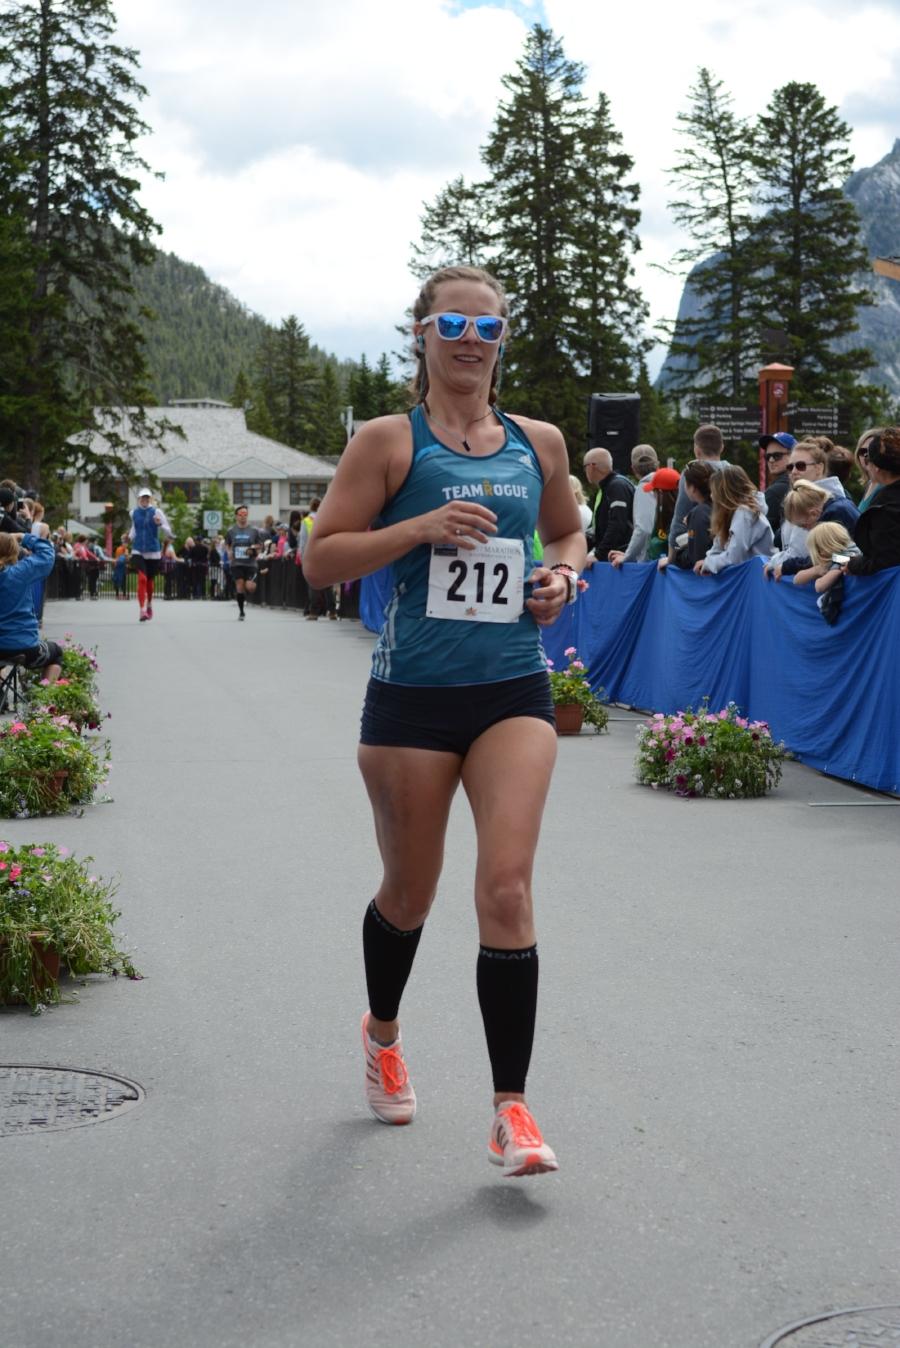 Can you see my bruised leg? Banff Marathon, Alberta Canada 2017.